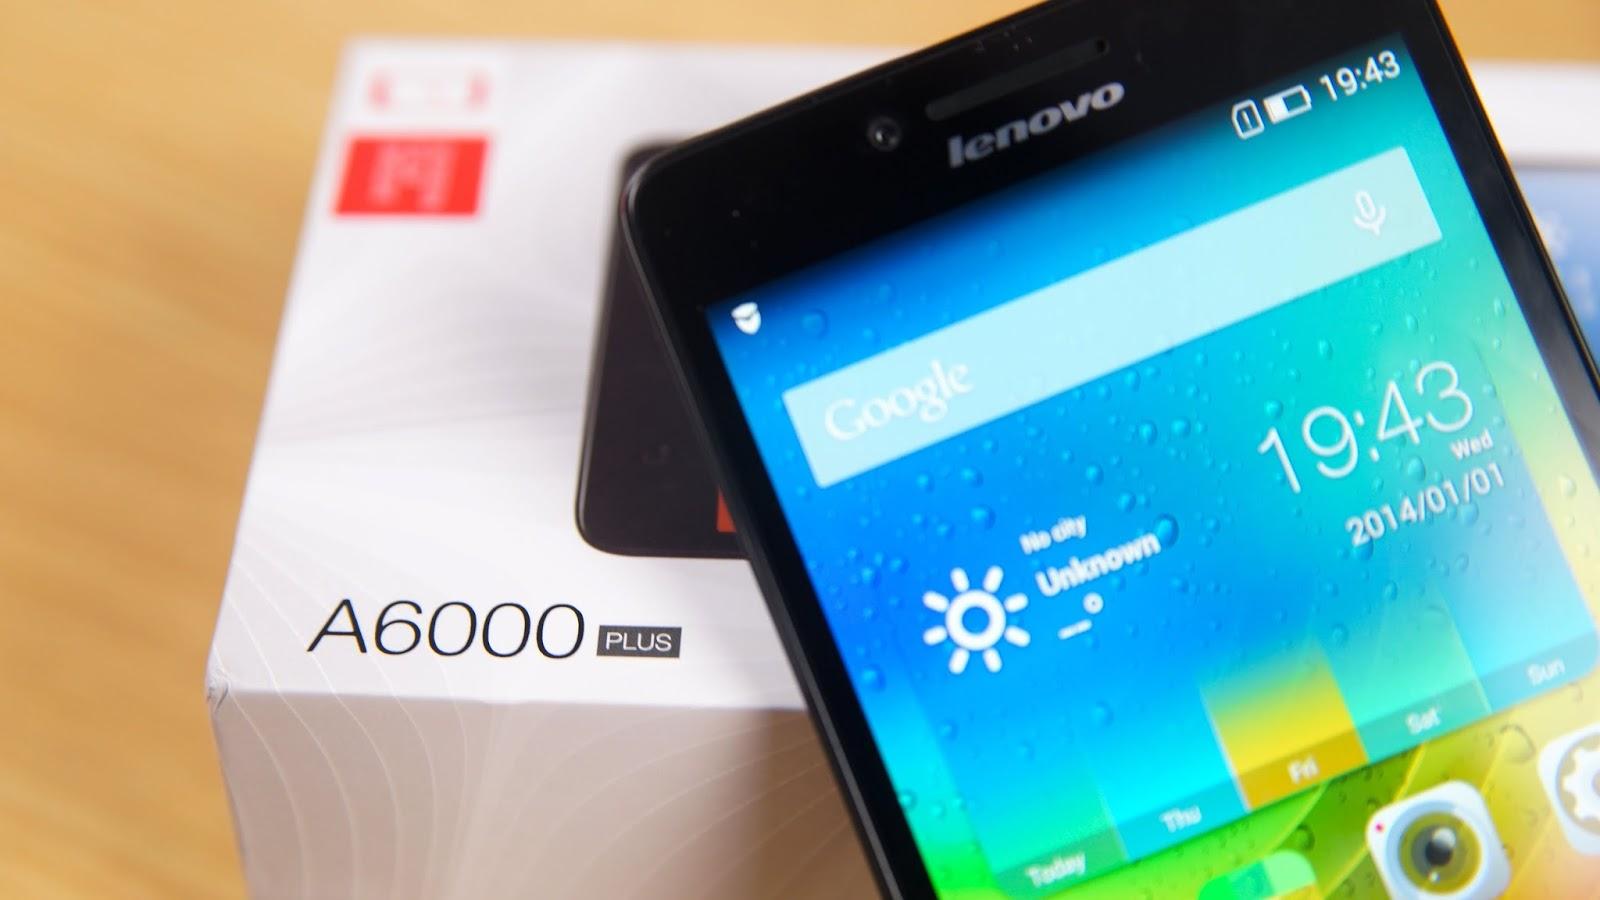 Review Lenovo A6000 Plus Review Elektronik And Gadget Review